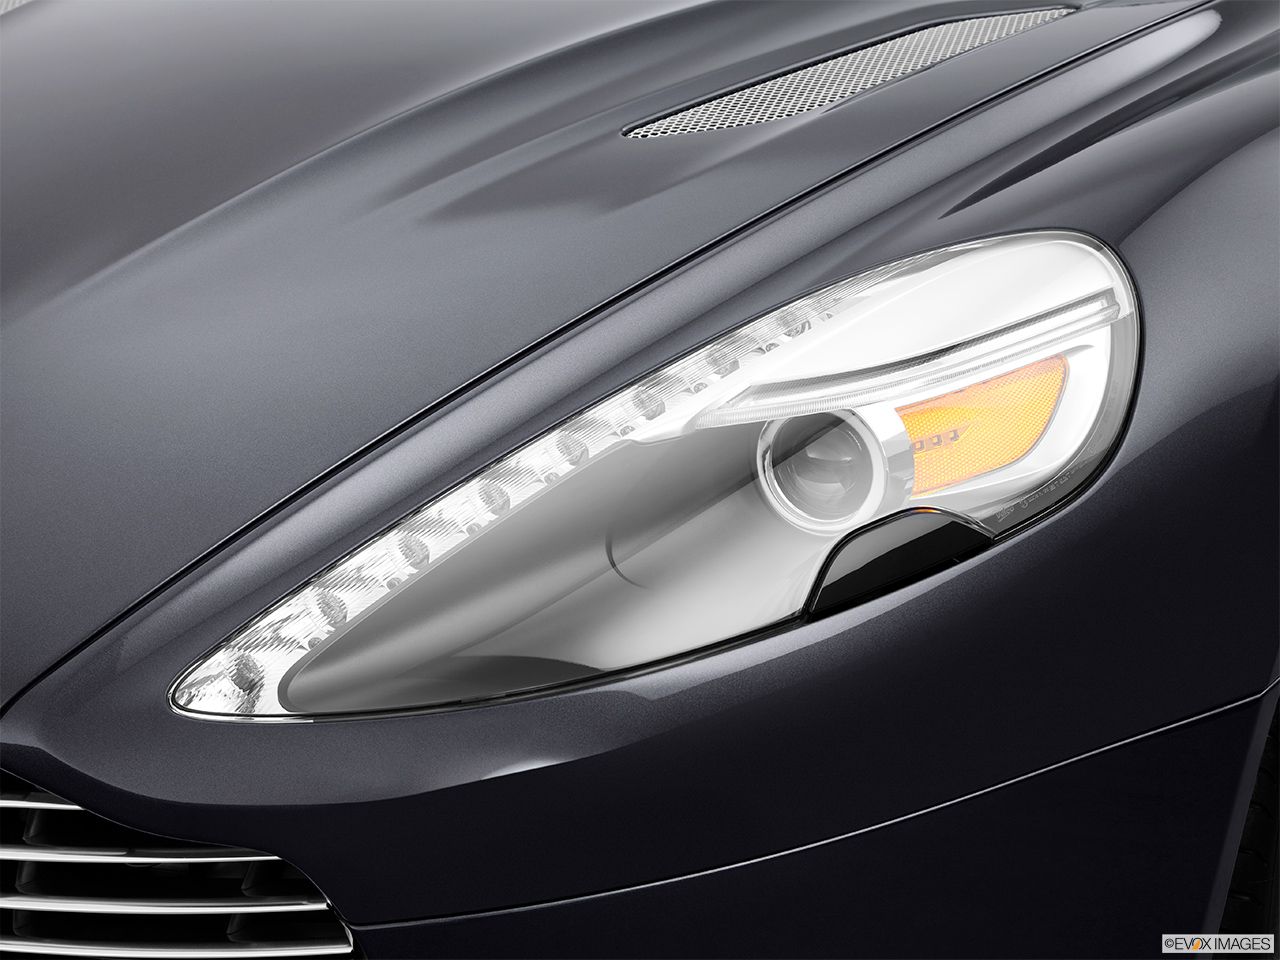 Aston Martin Vanquish Coupe Front Angle View Aston - Aston martin headlights